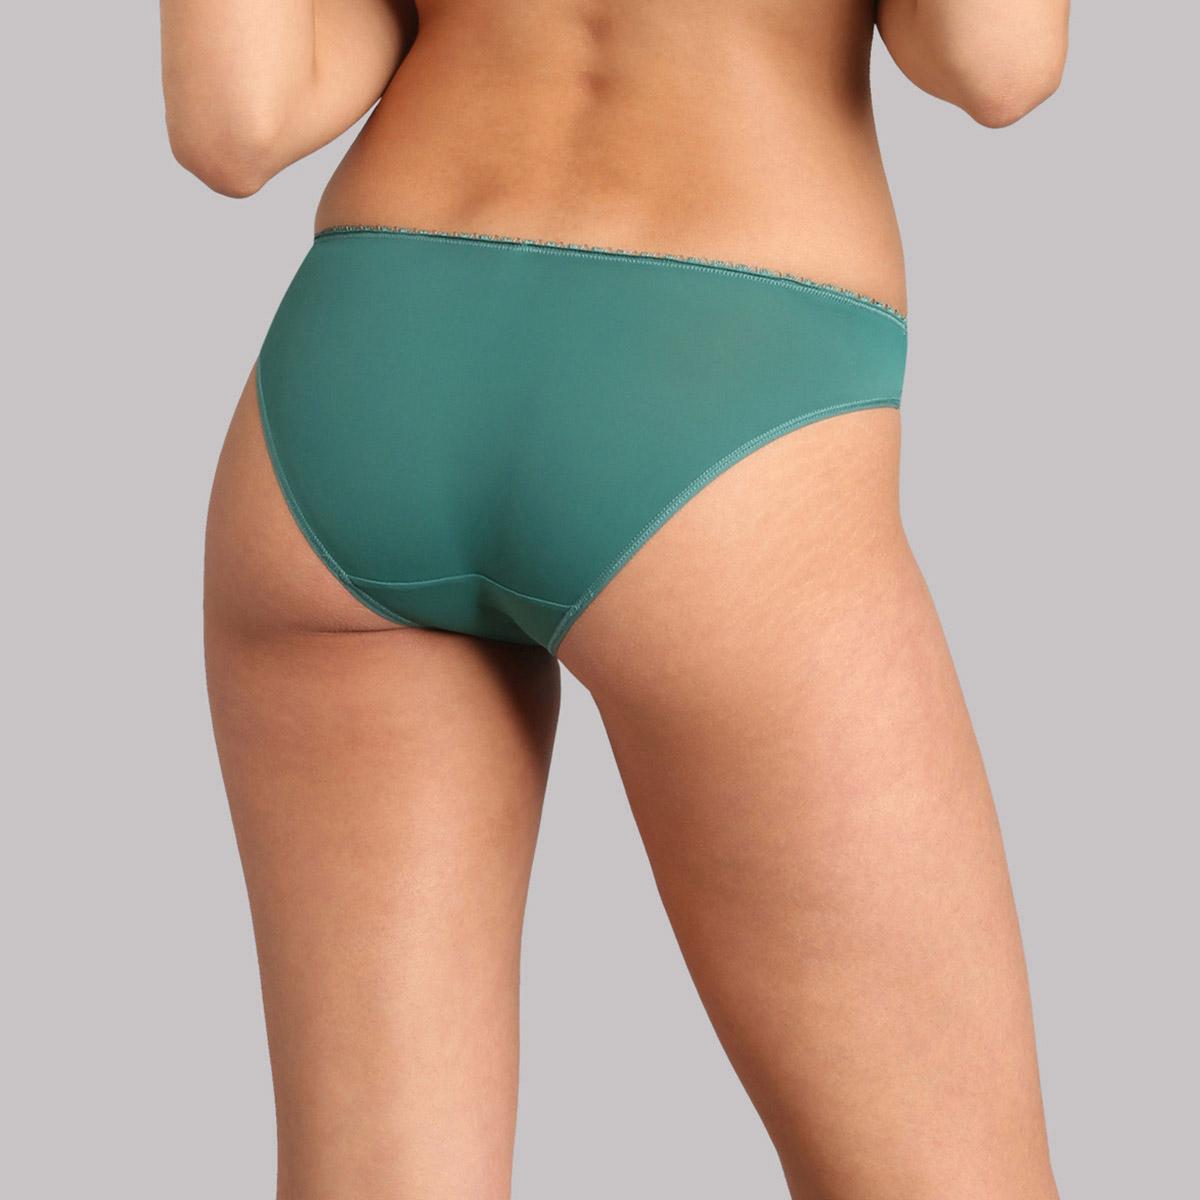 Bikini style knickers in palm green - Flower Elegance, , PLAYTEX